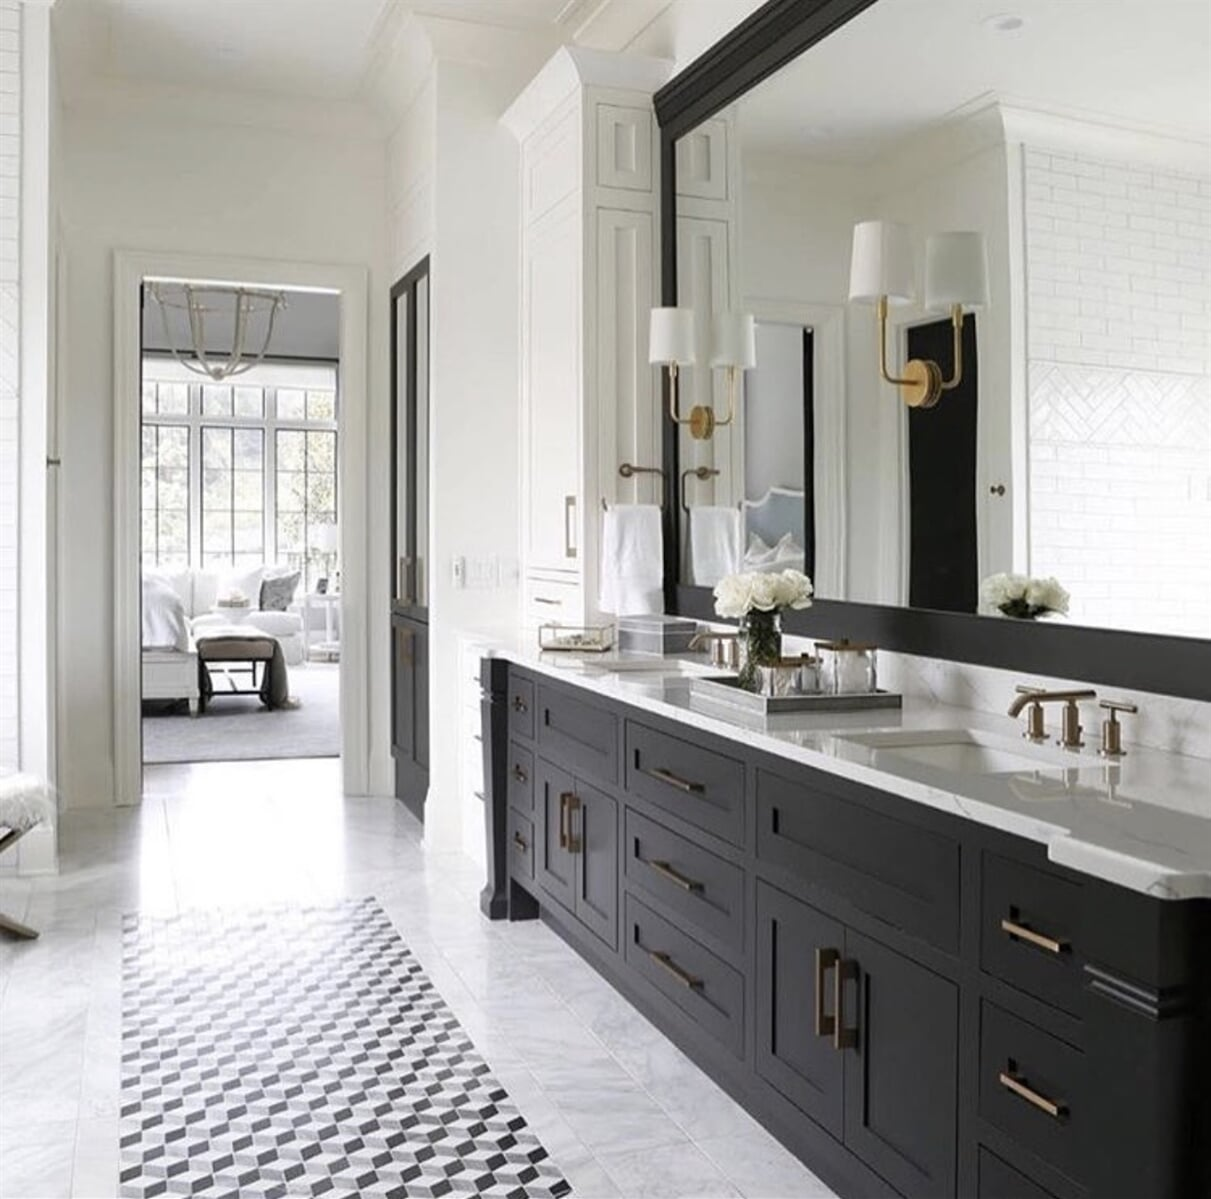 Elegant Bathroom Tile Installation in Suwanee, GA